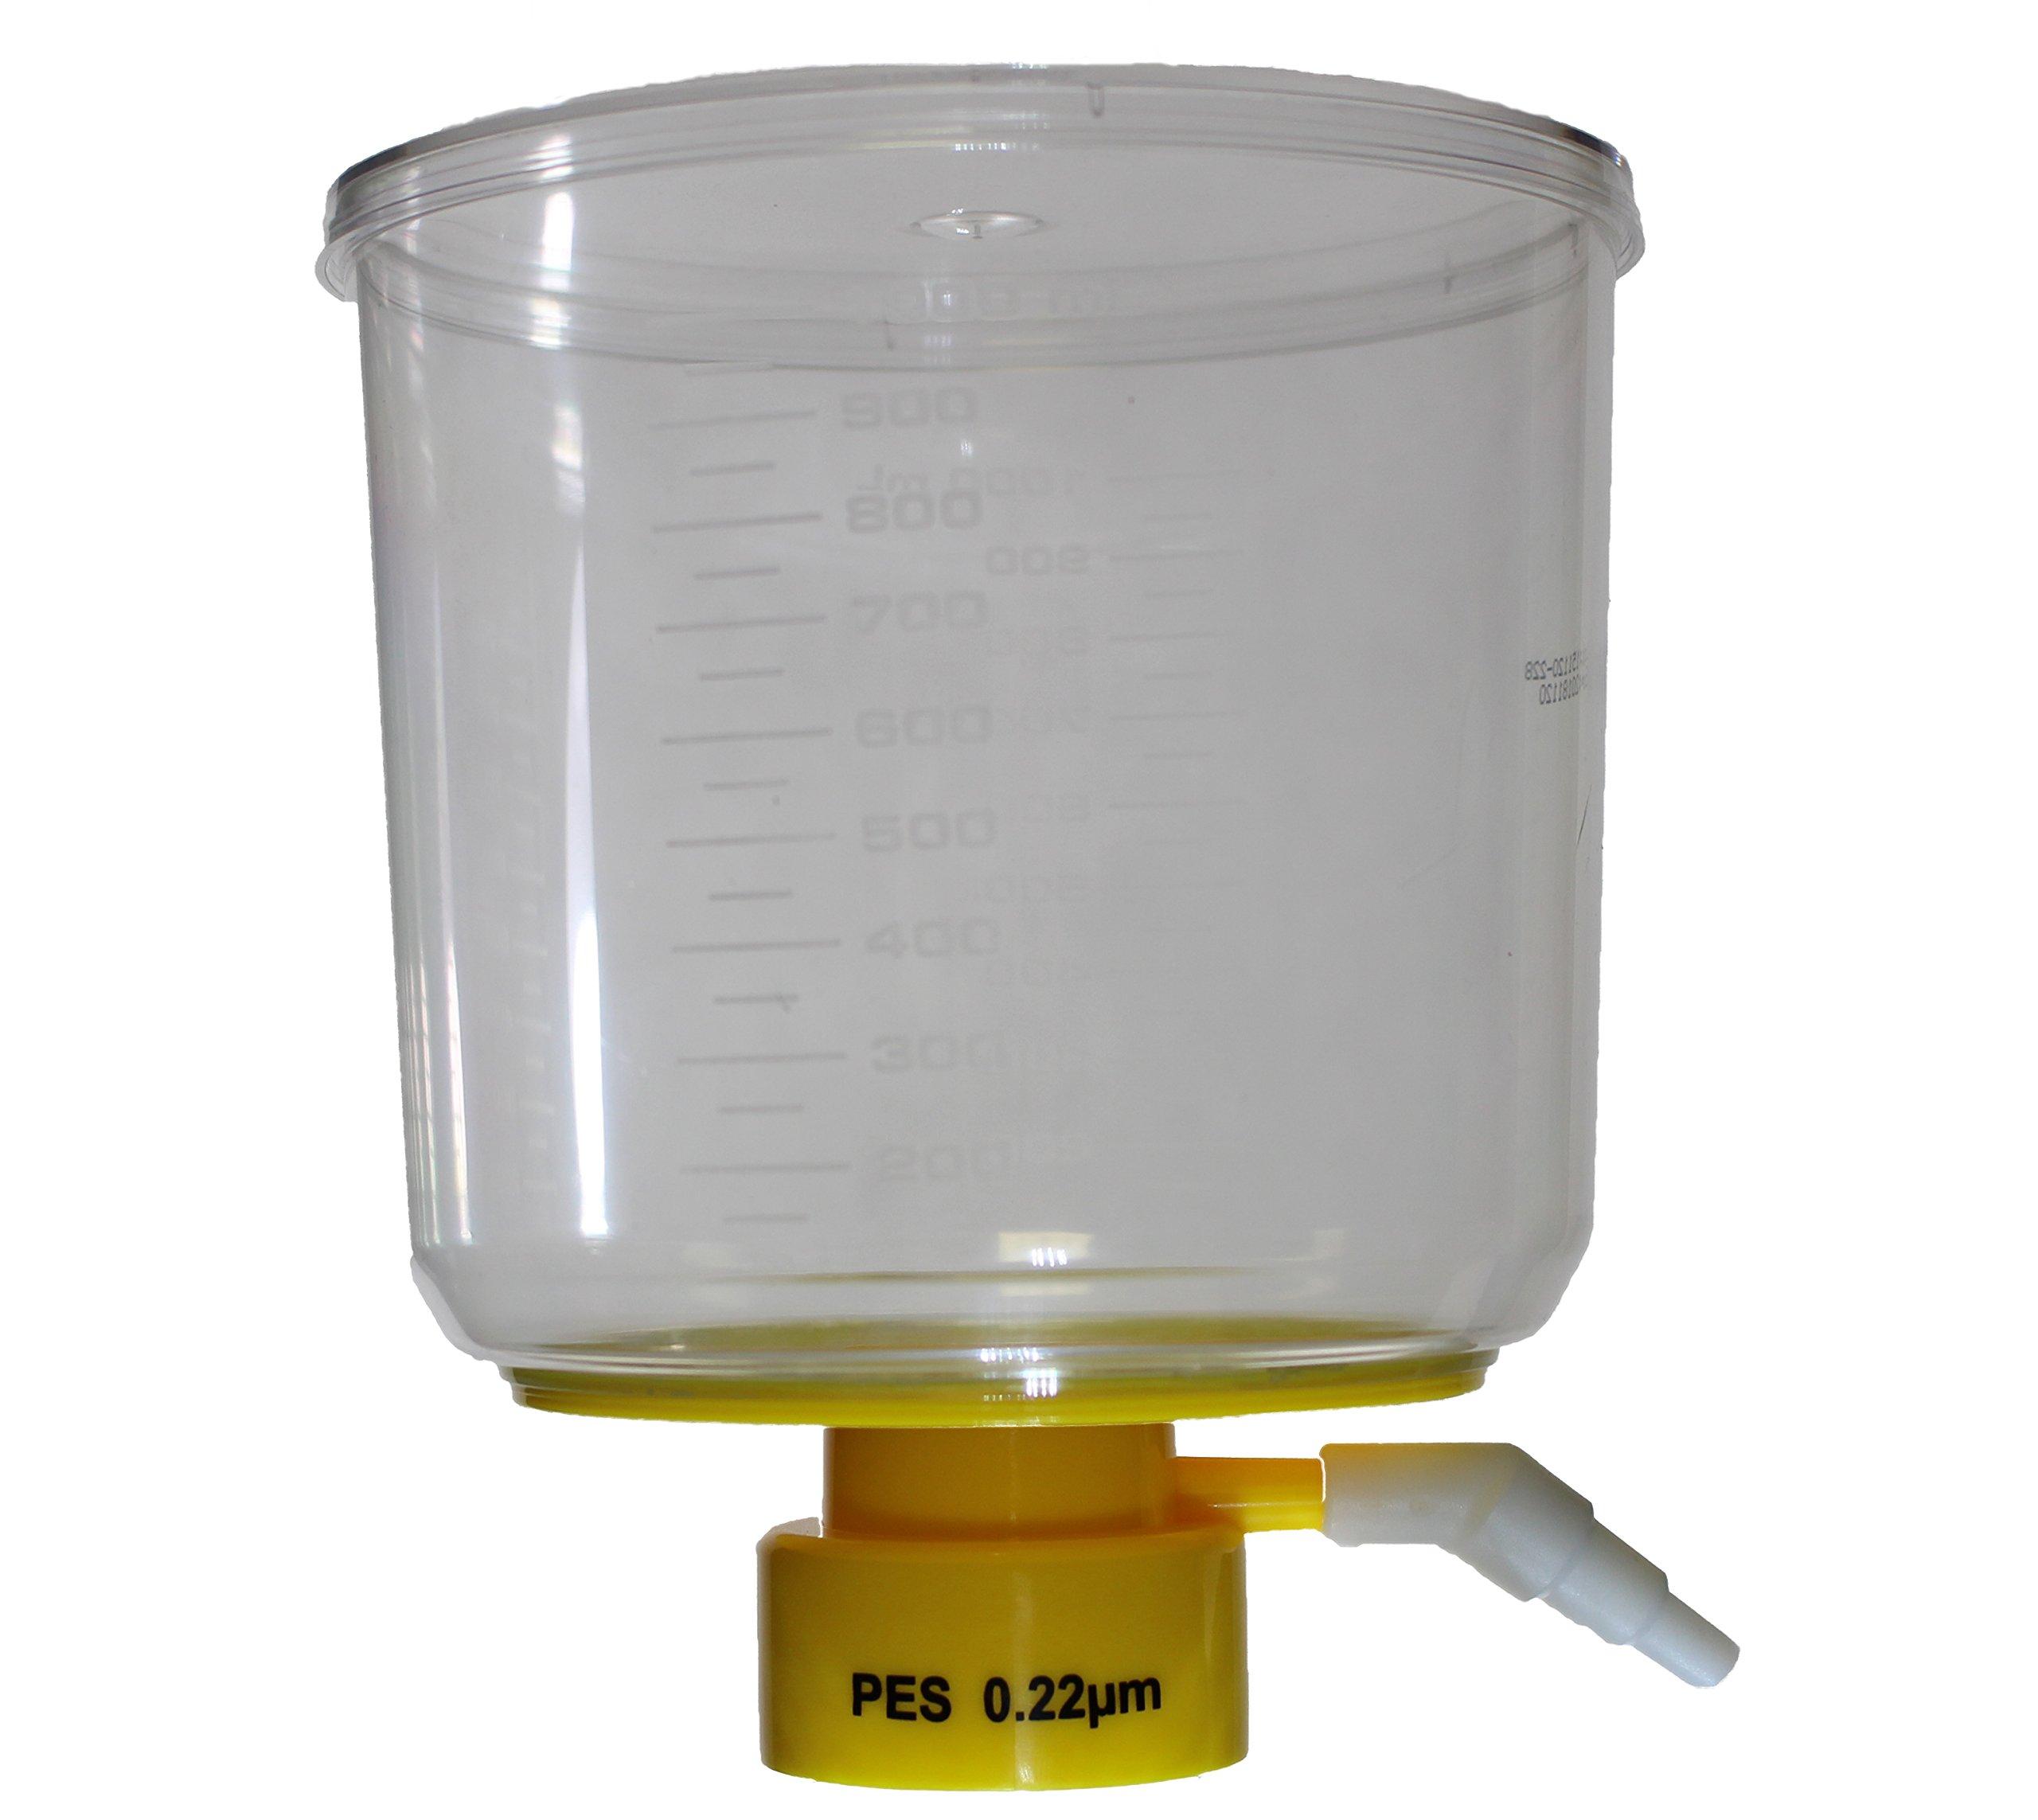 1000 mL Bottle Top Vacuum Filter, 0.22 um, PES, Sterile, Case of 12